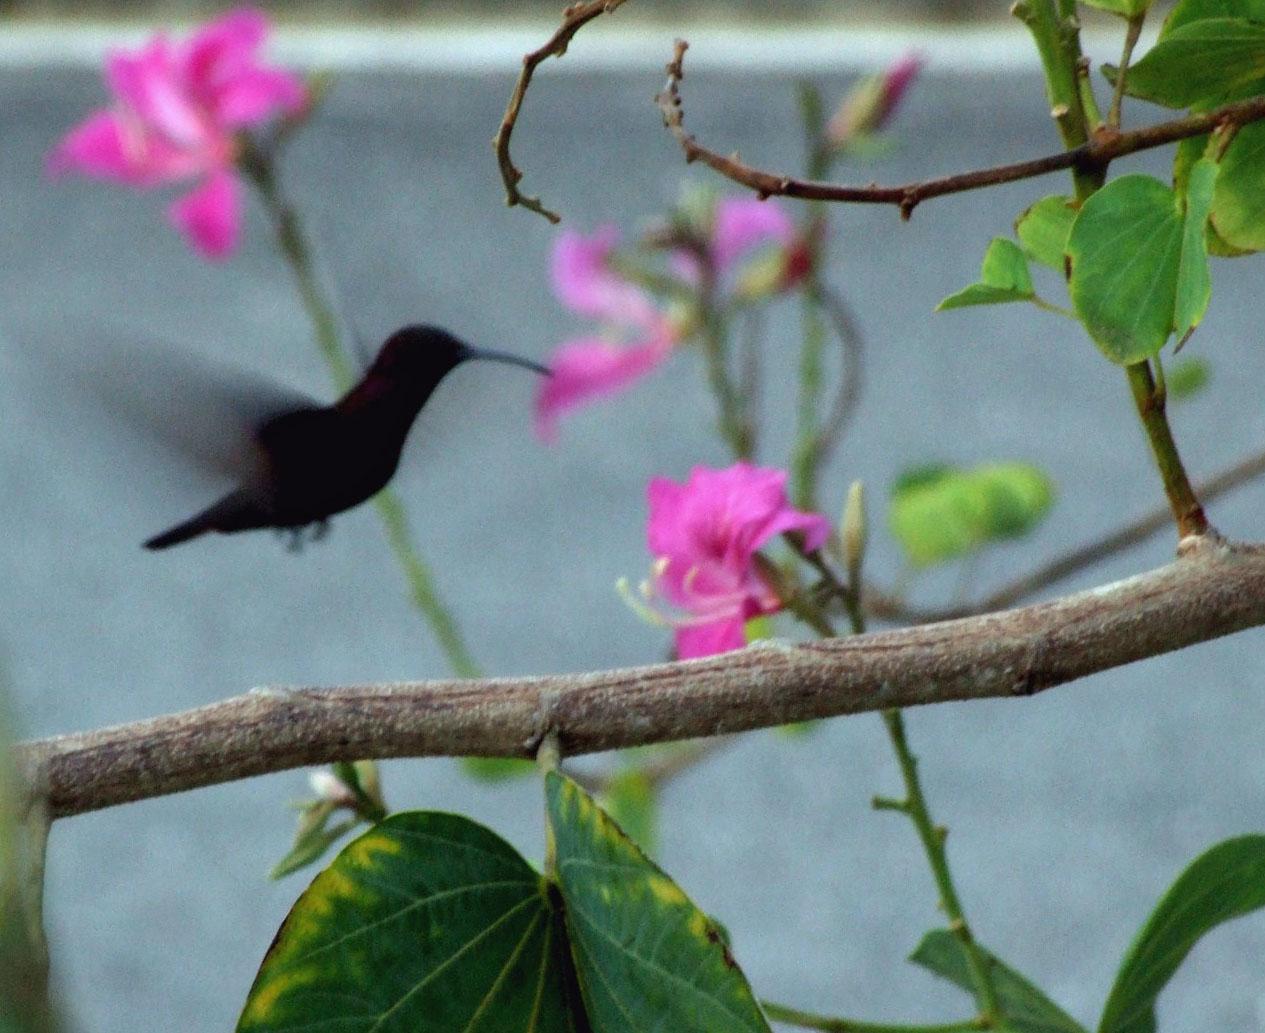 Hummingbird feeding at pink flower